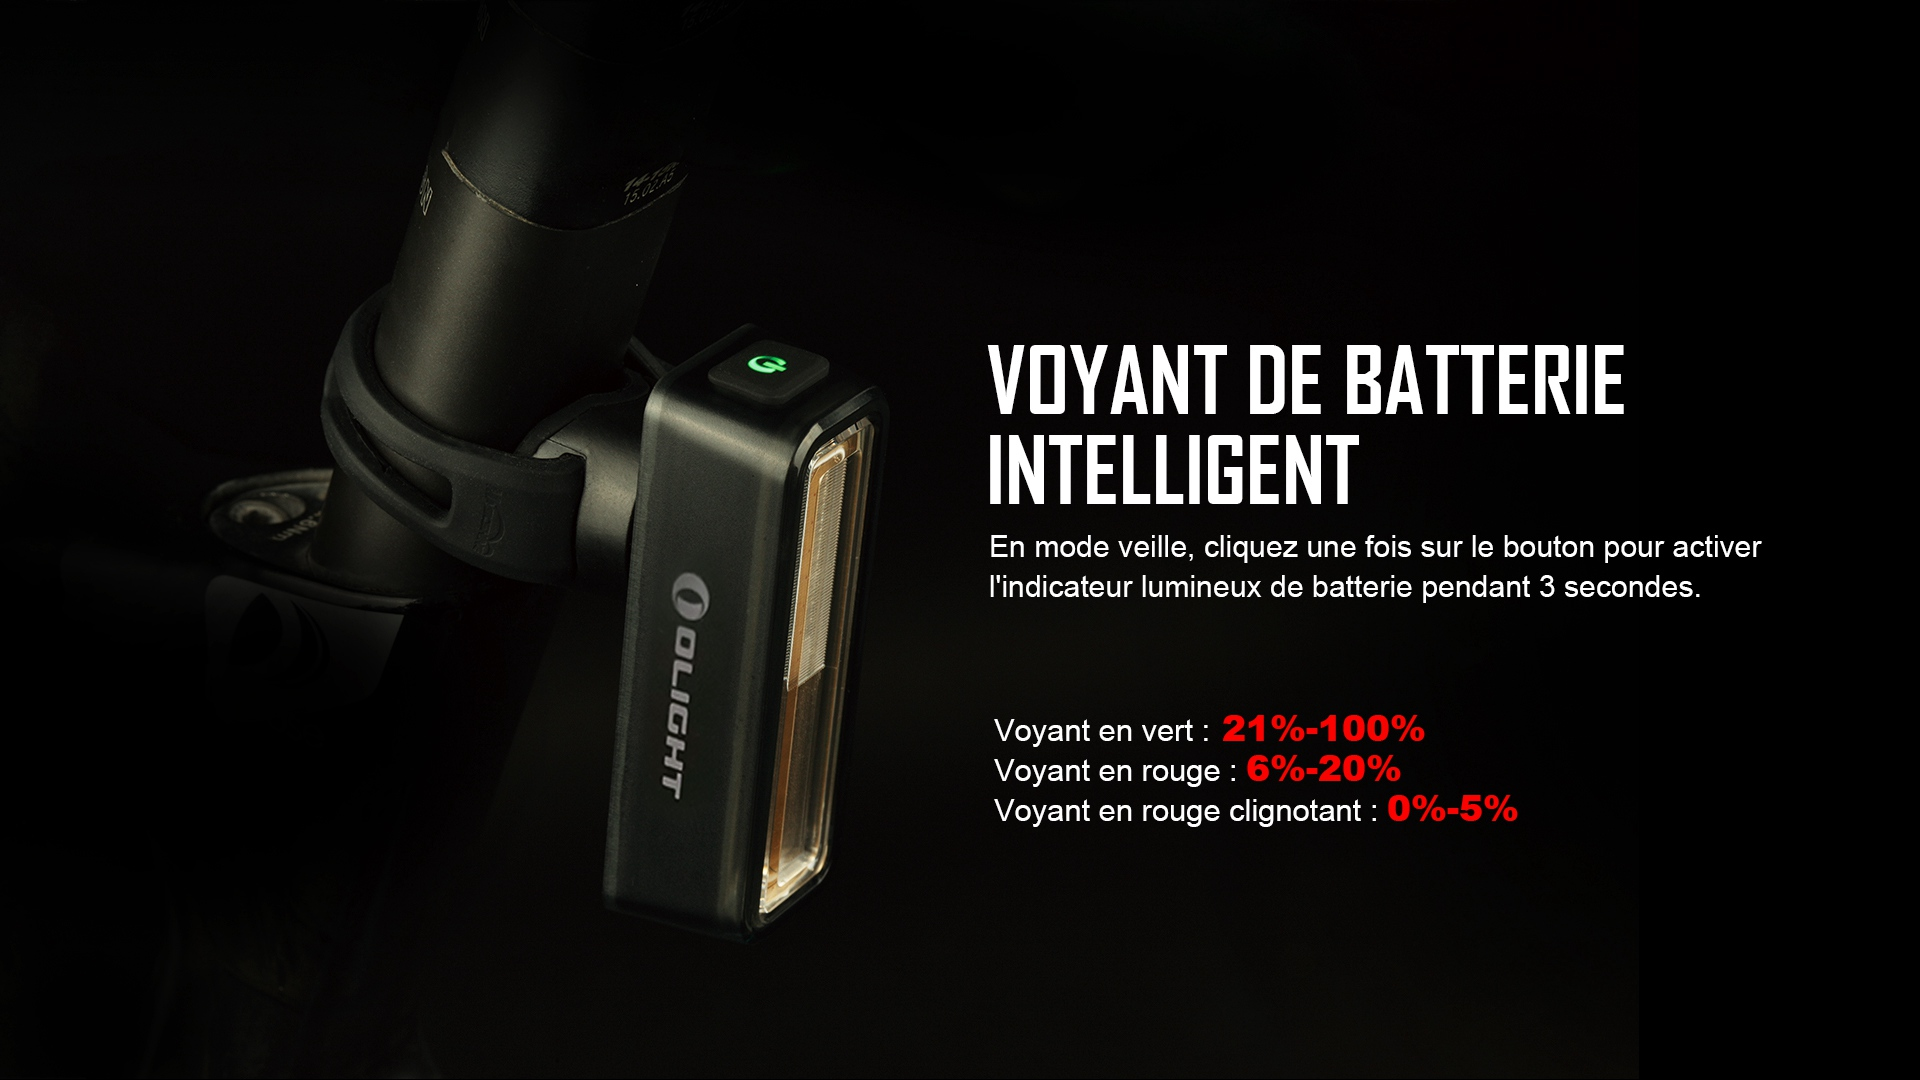 lampe vélo voyant en vert : 21% - 100%